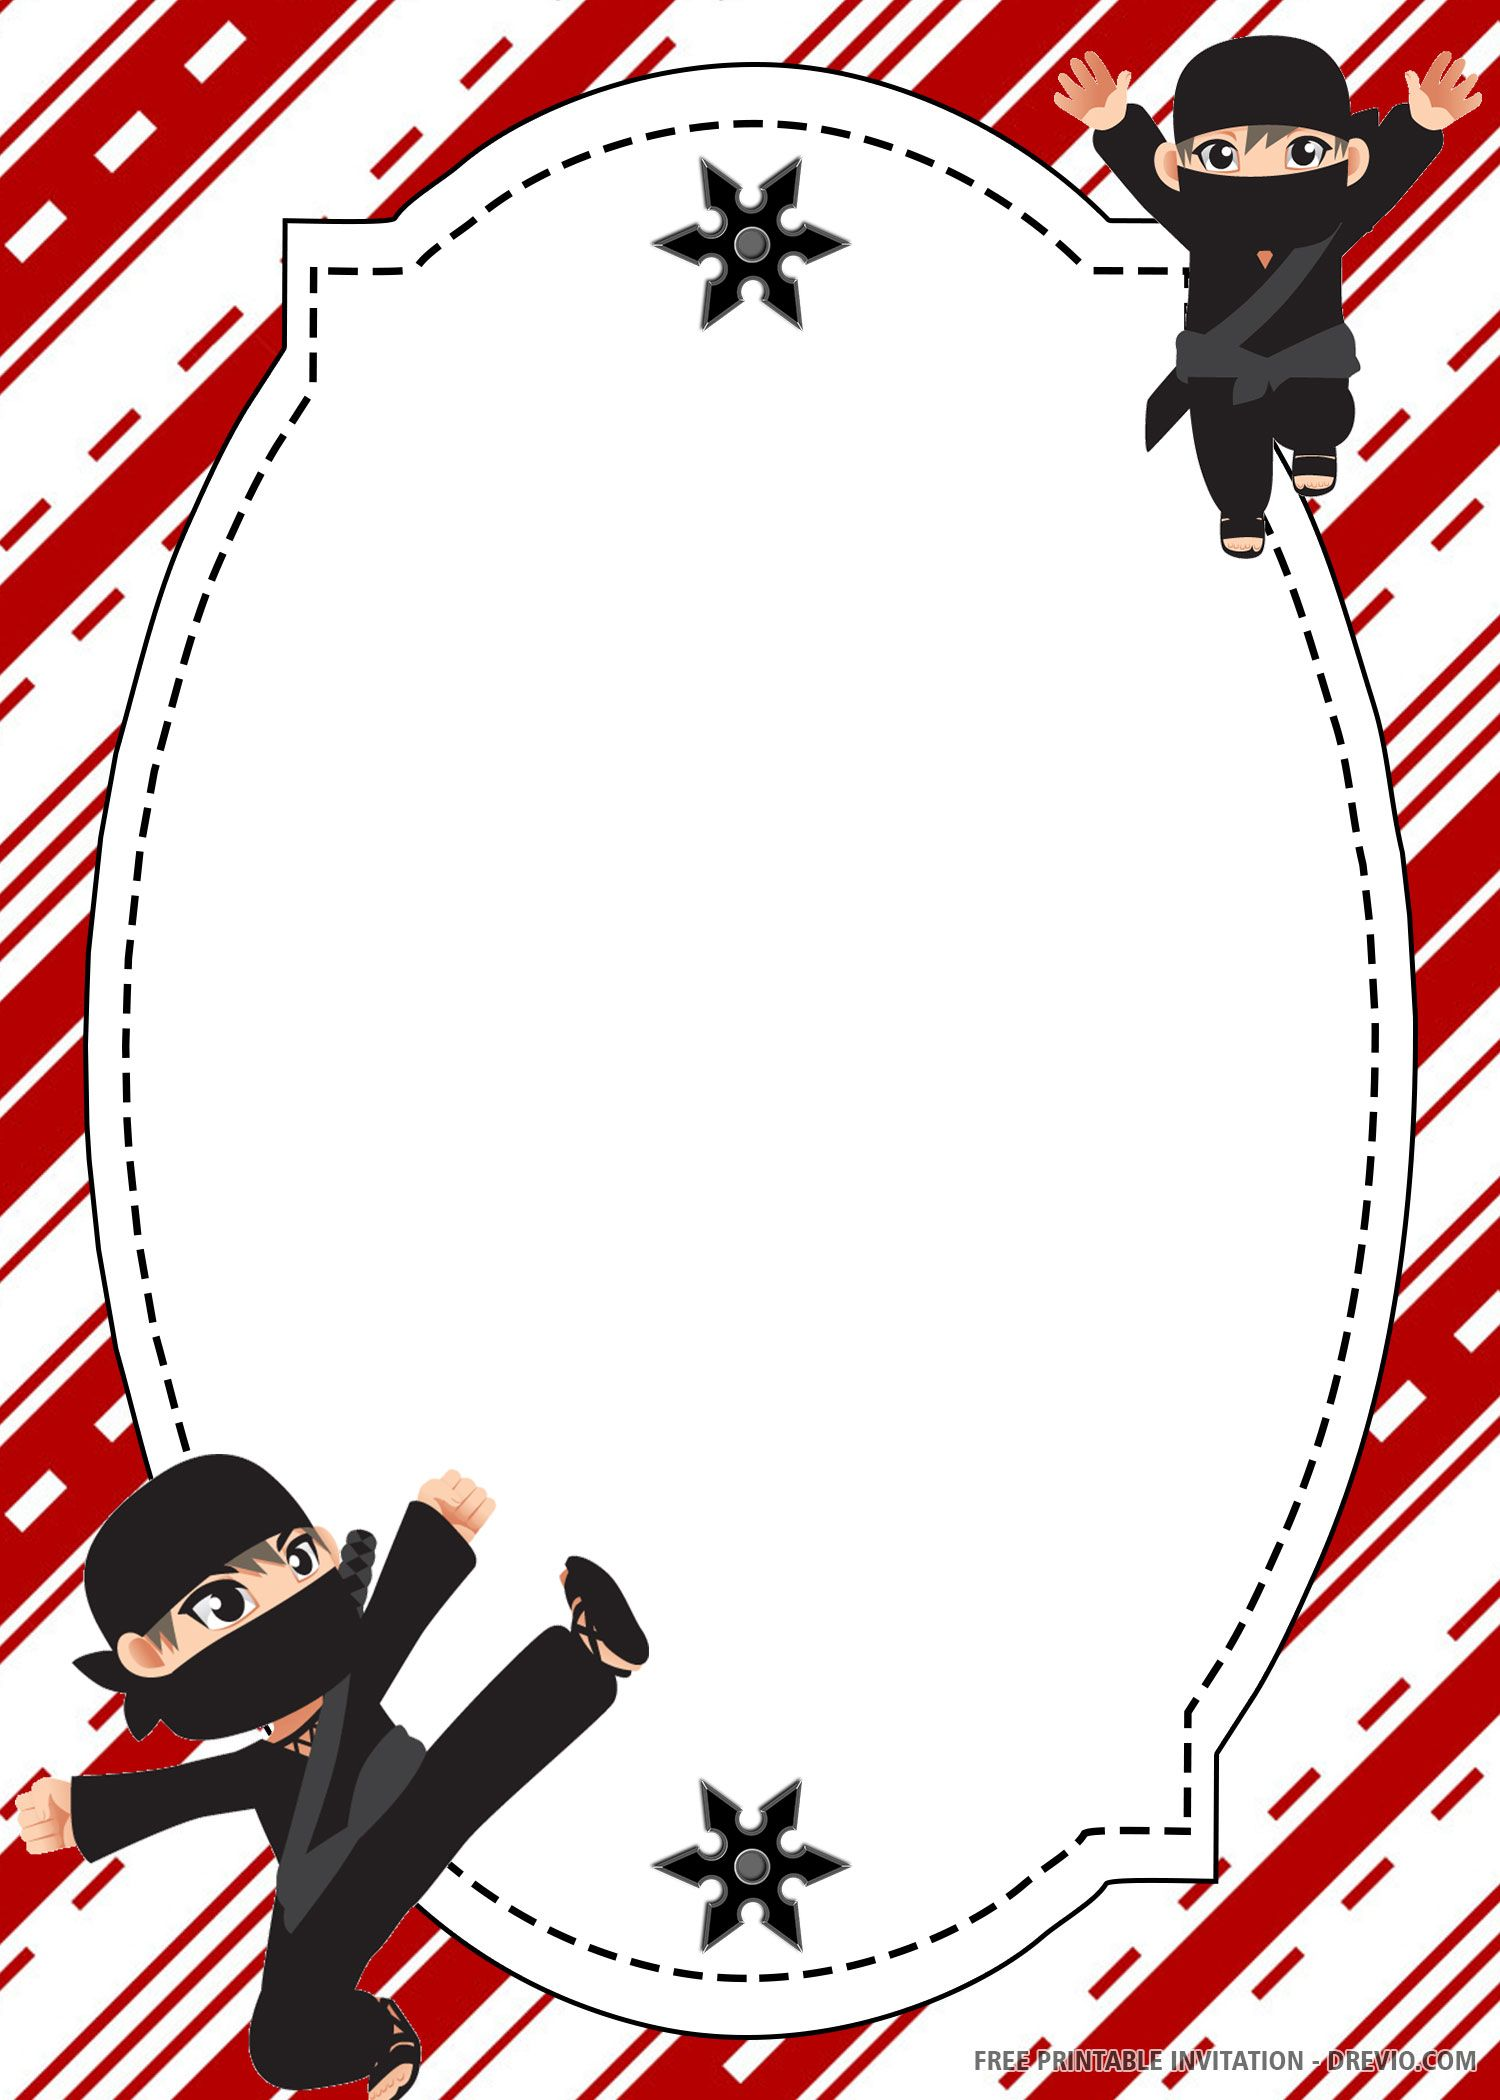 FREE PRINTABLE) - Ninja Birthday Invitation Template  DREVIO